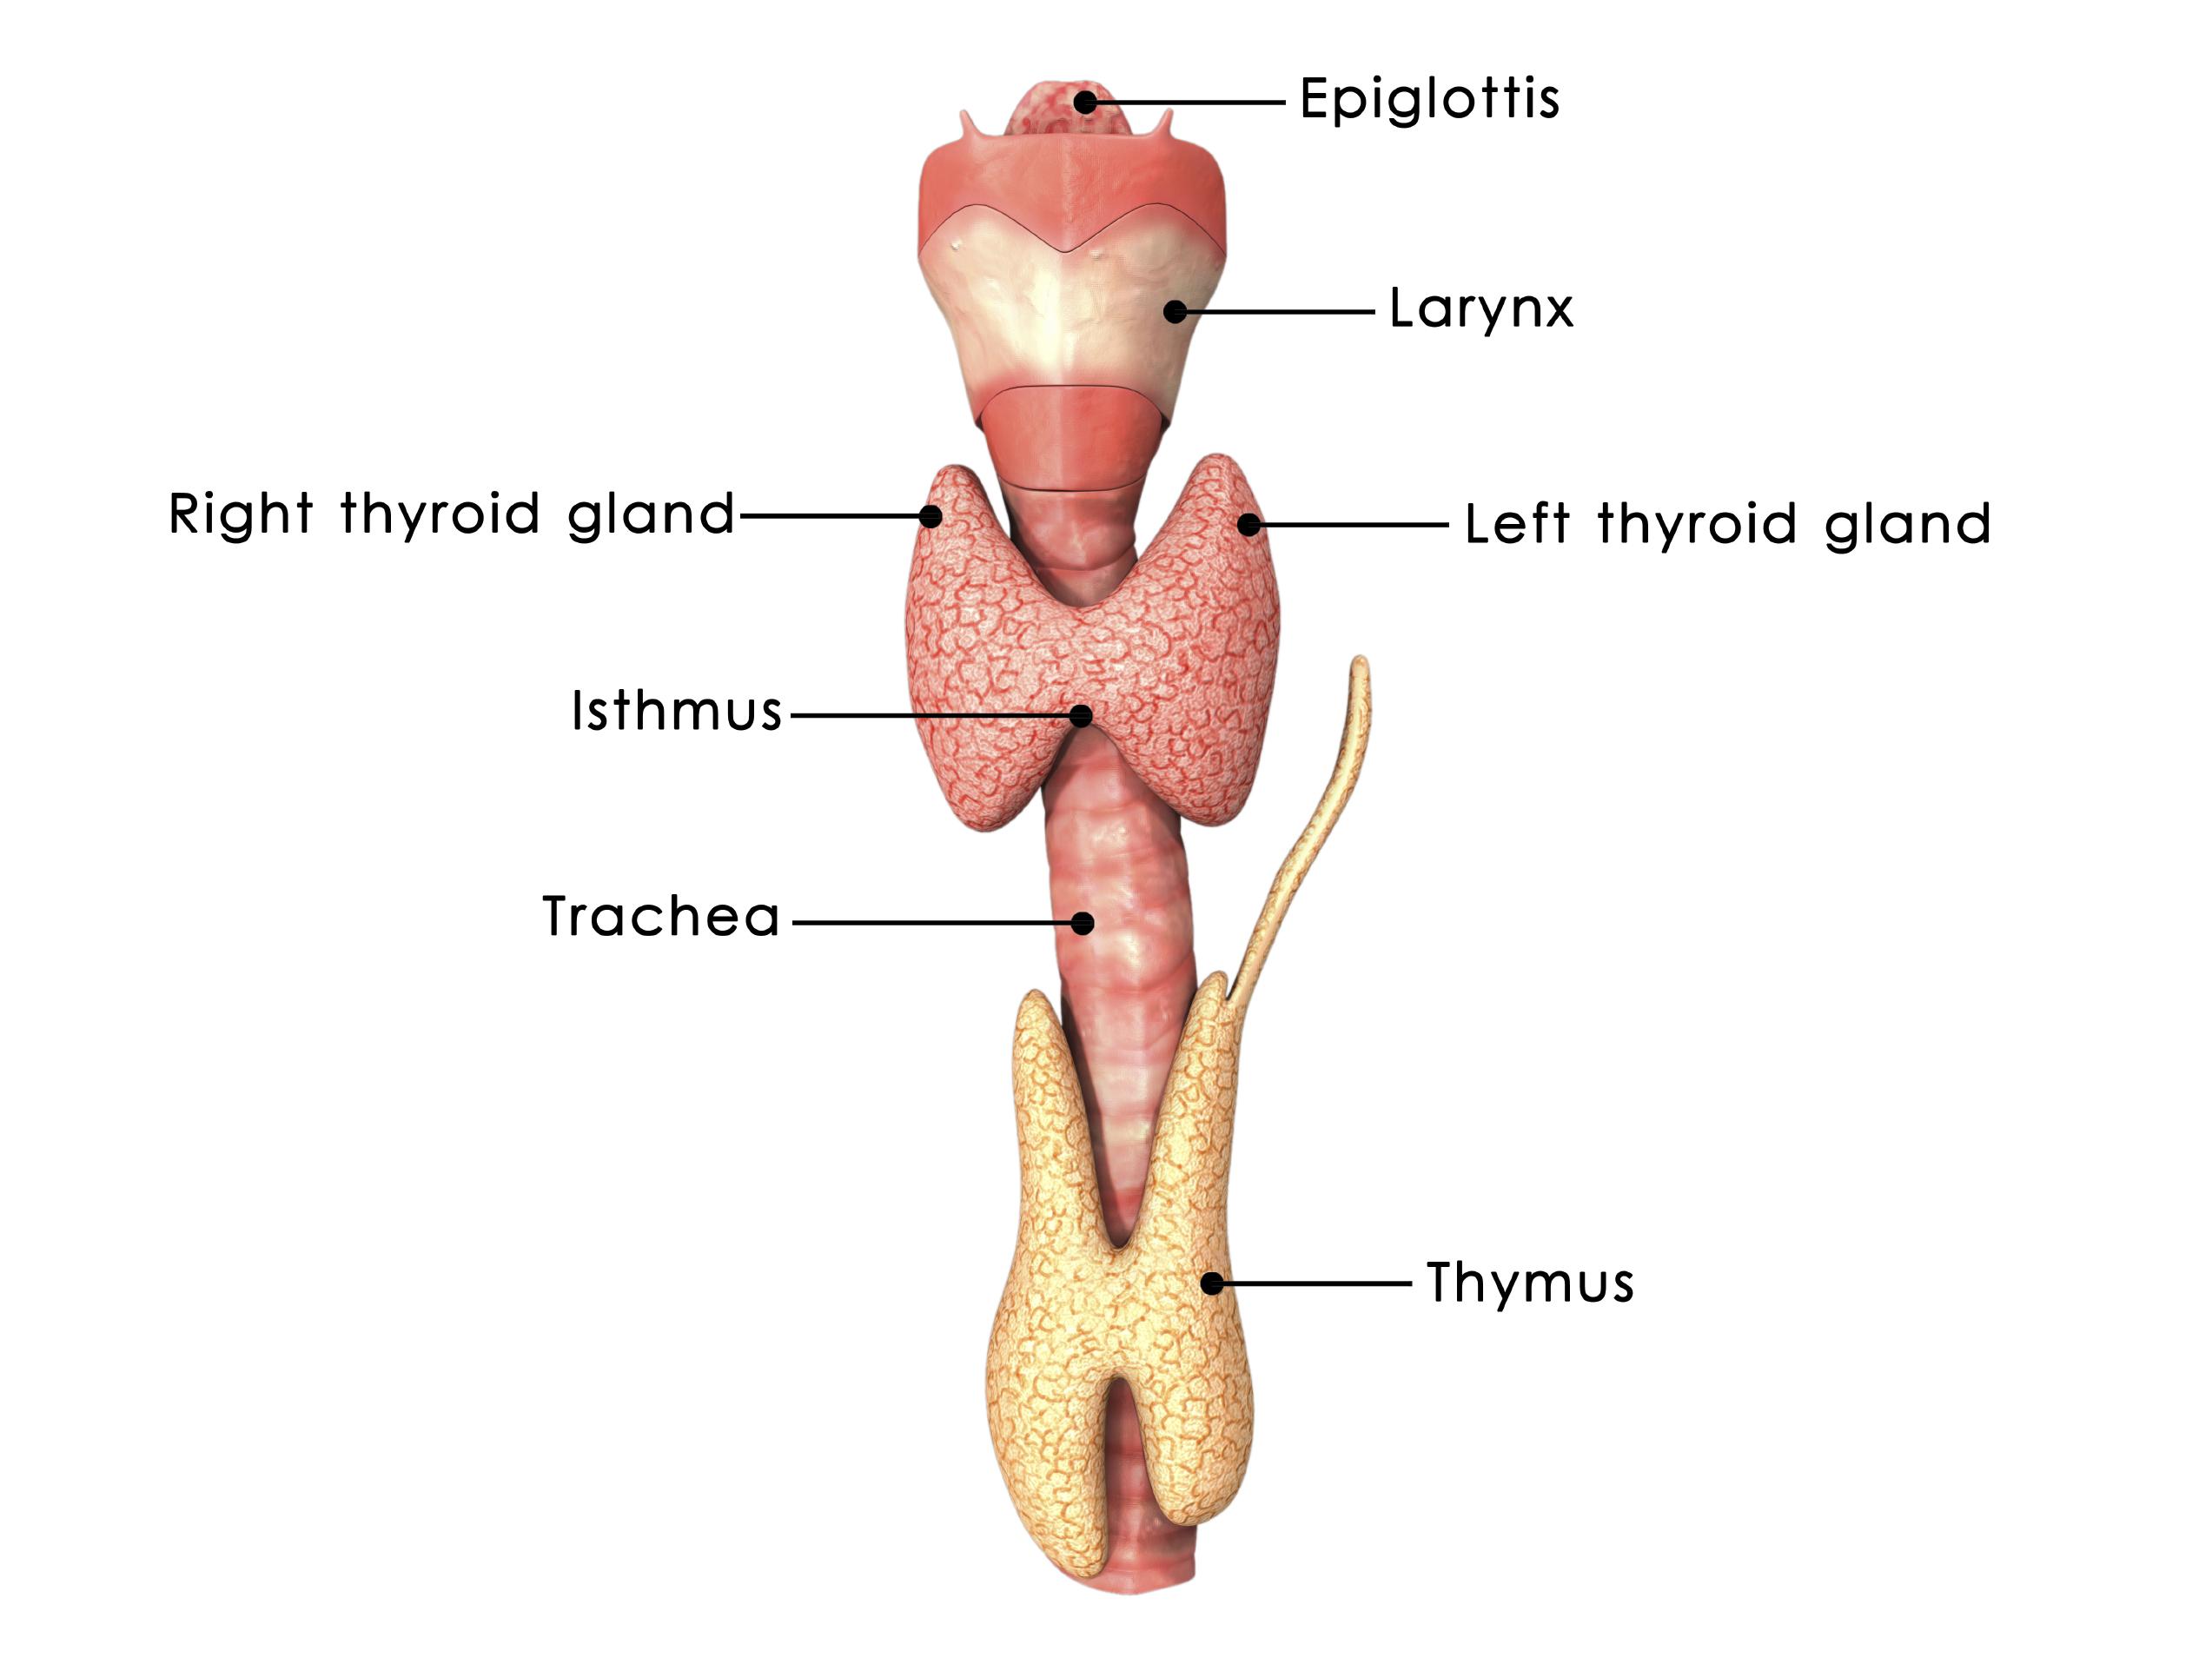 Secrets Of Korean Medicine Part 23 Thyroid Disease Can Be Fully